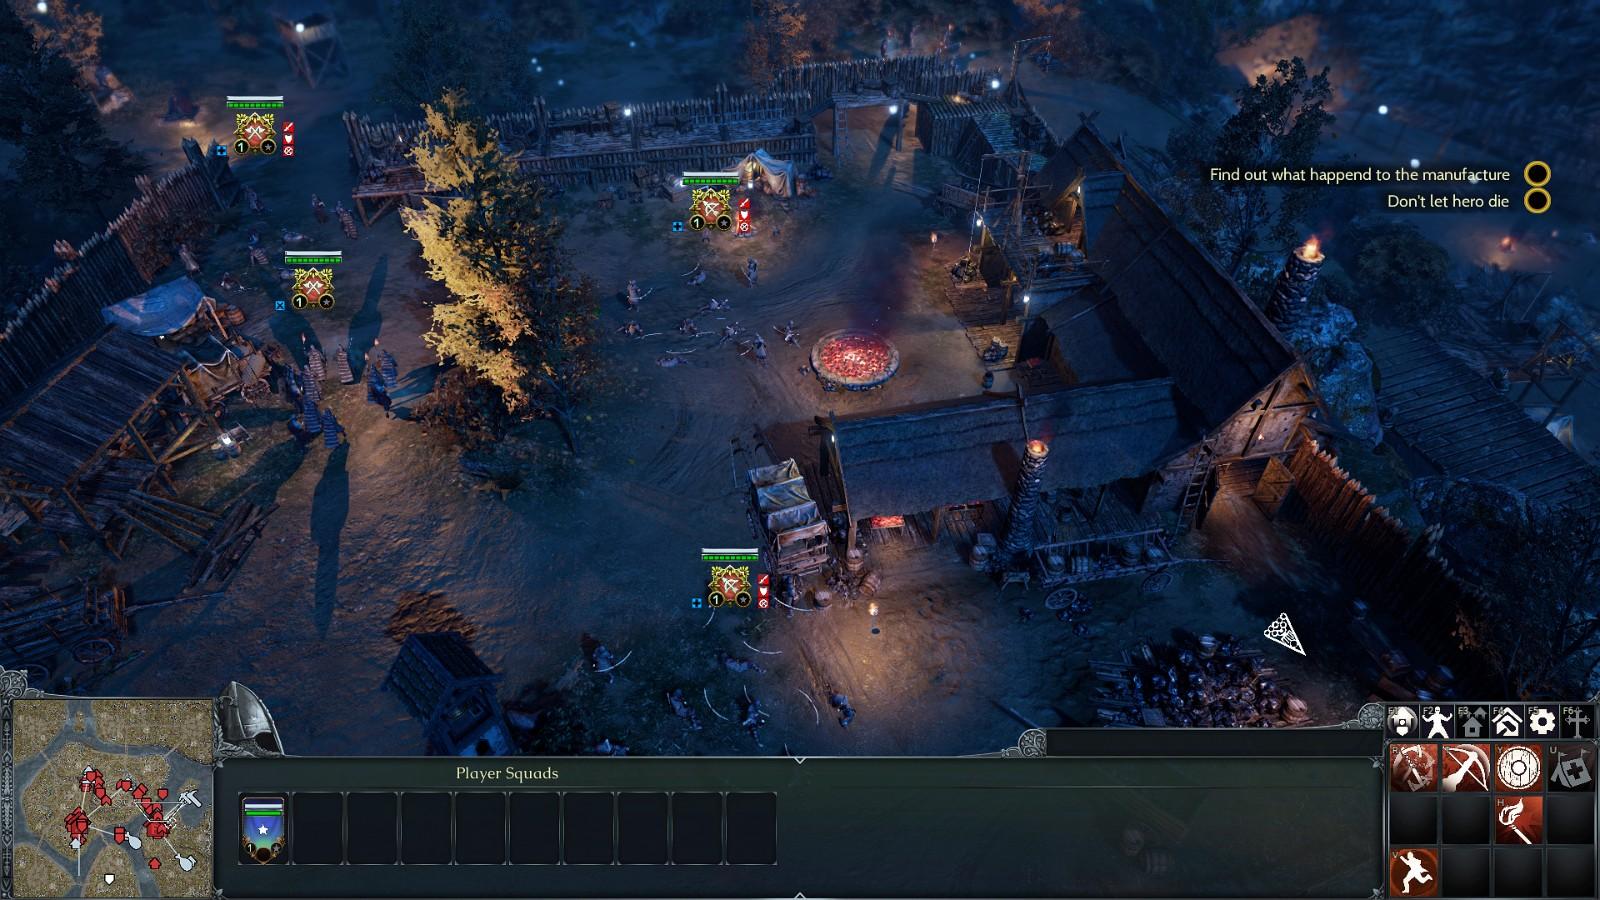 RTS《祖先:遗产》农民版在Steam上发布 免费体验